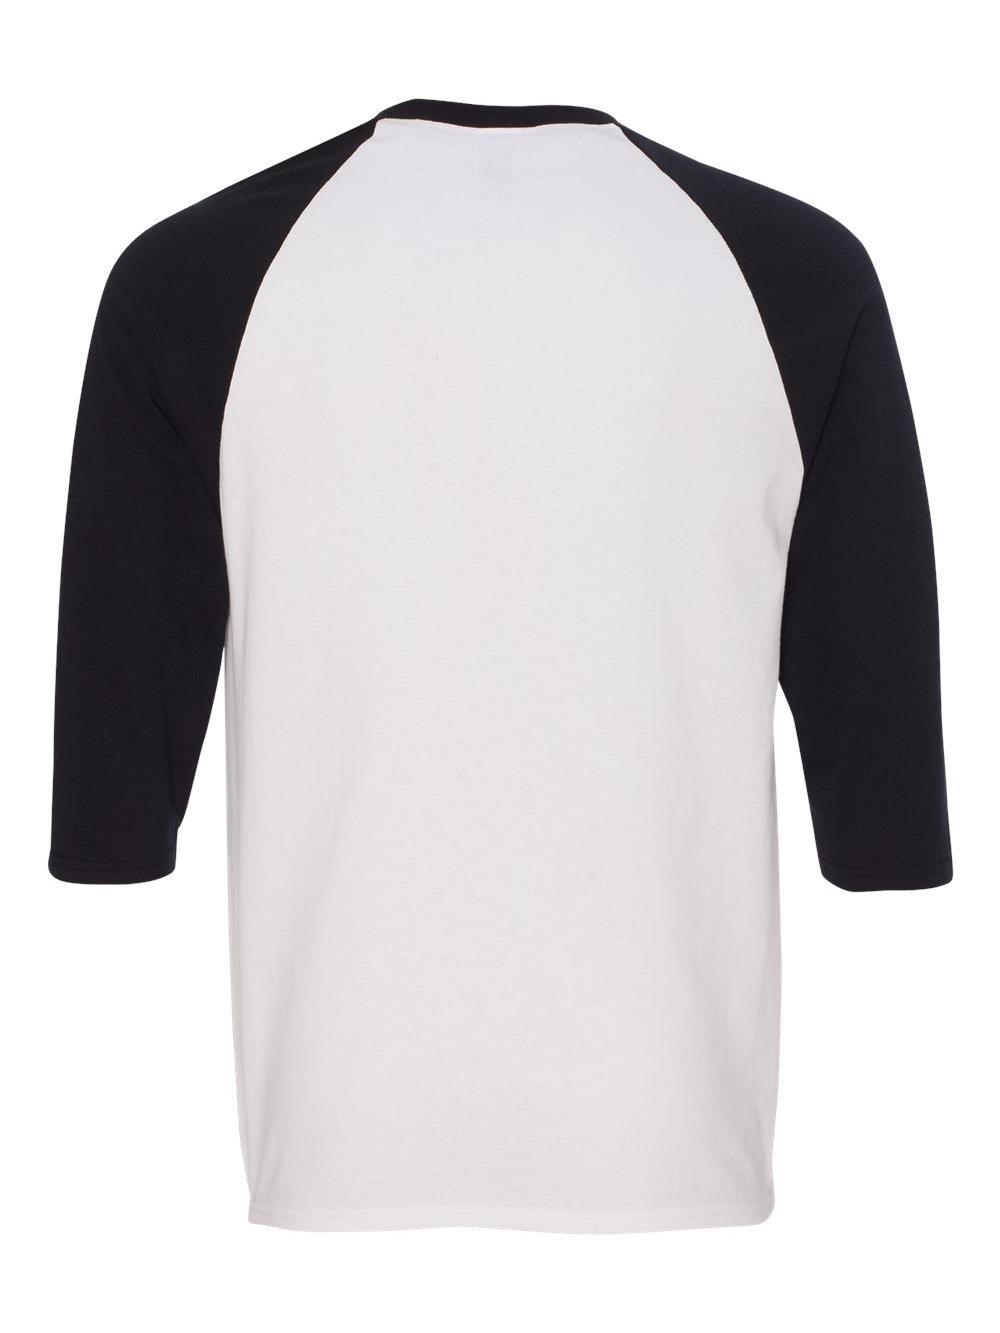 Gildan-Heavy-Cotton-Three-Quarter-Raglan-Sleeve-Baseball-T-Shirt-5700 thumbnail 19